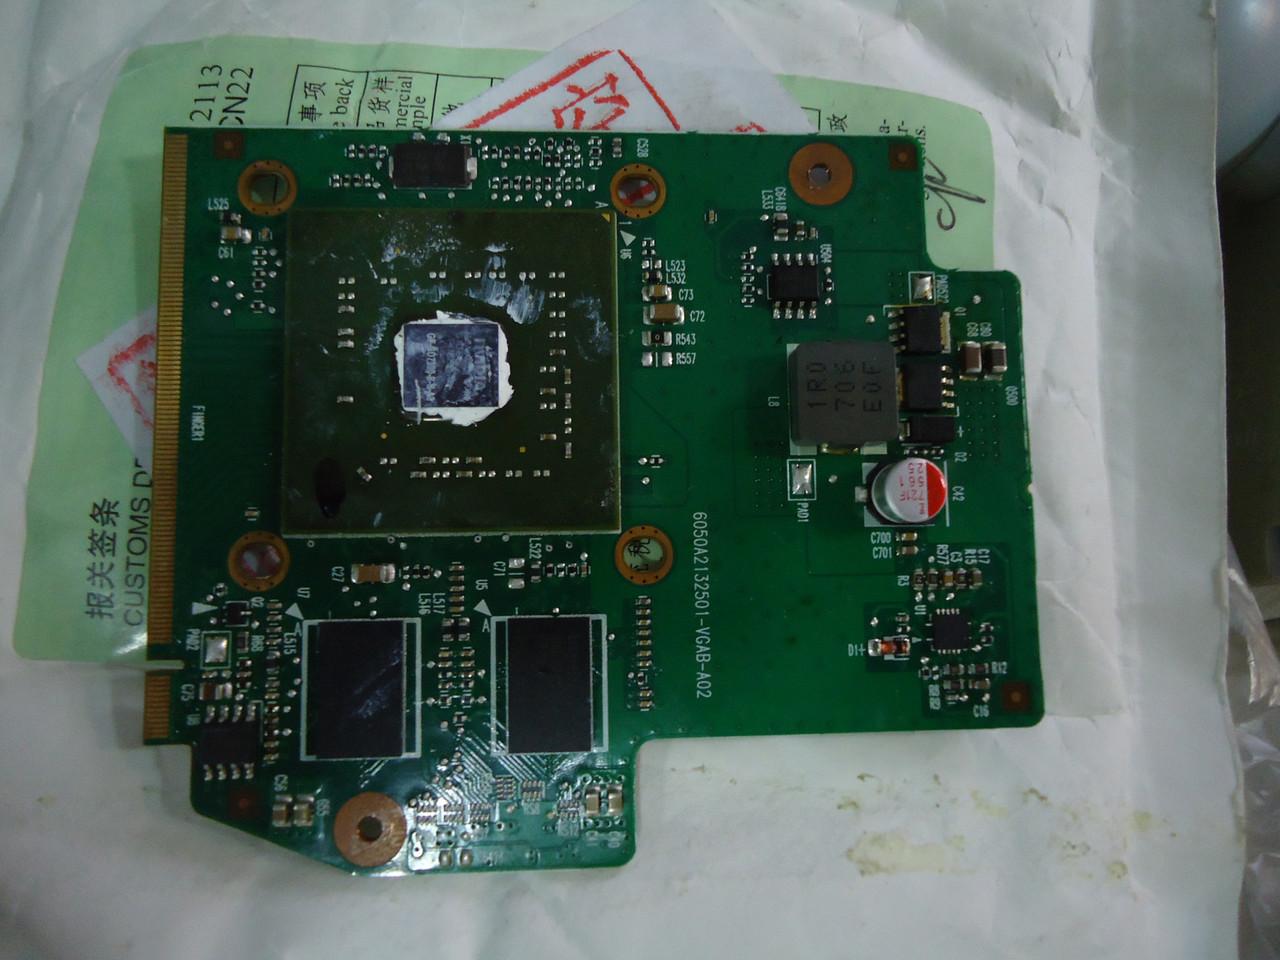 Видеокарта Toshiba A200 Nvidia G72MV 128MB VGA Video Card V000100500 6050A2132501-VGAB-A02